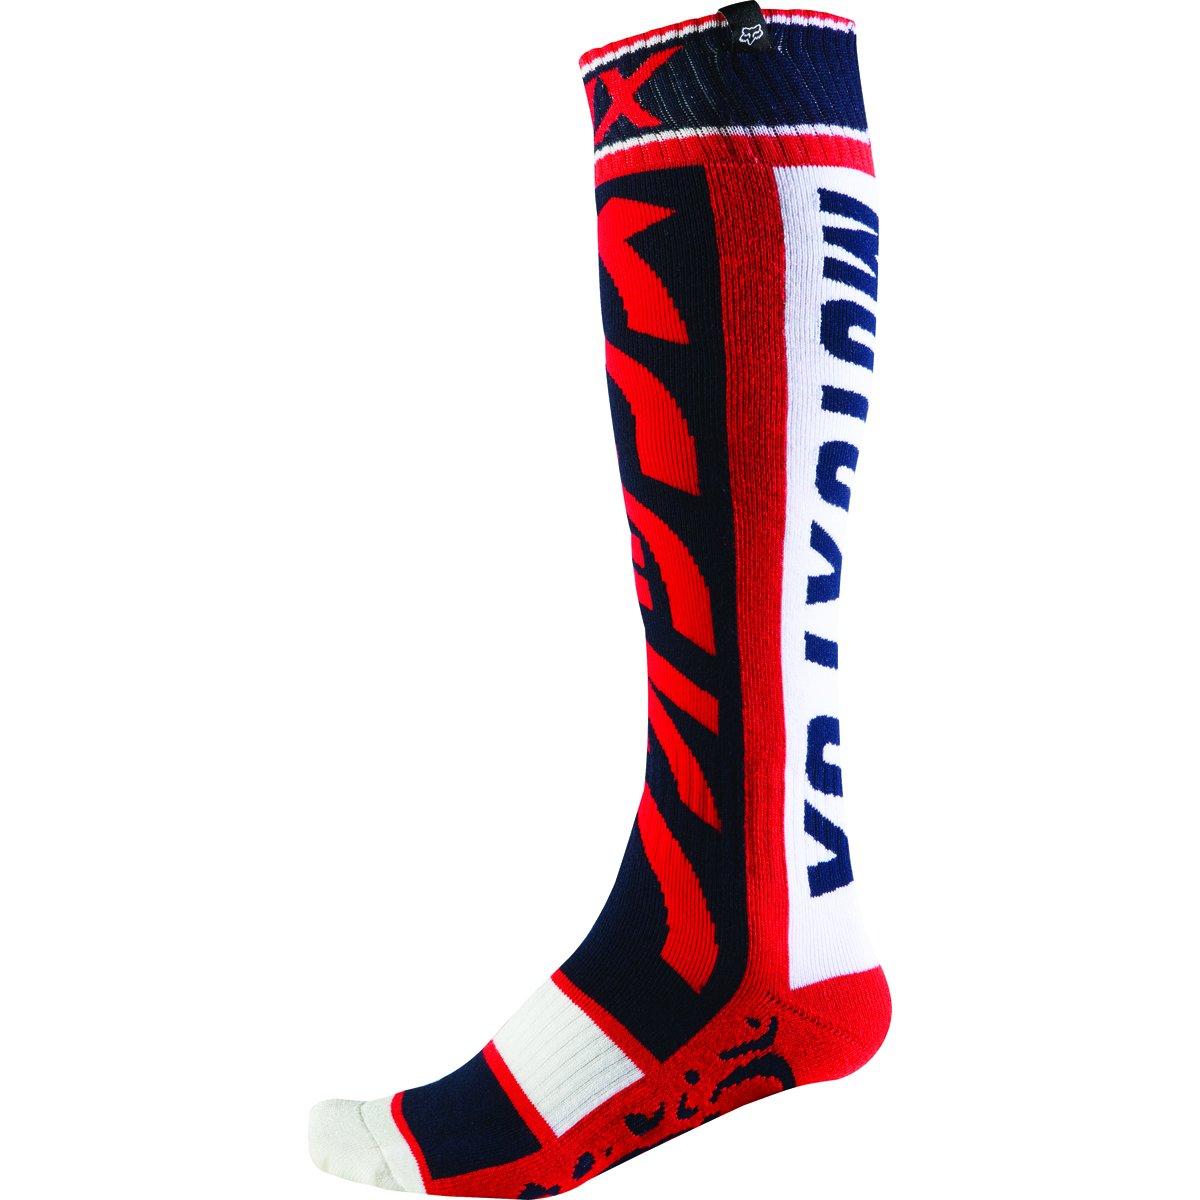 Fox Racing FRI Thin Divizion Men's MotoX Motorcycle Socks - Red / Small